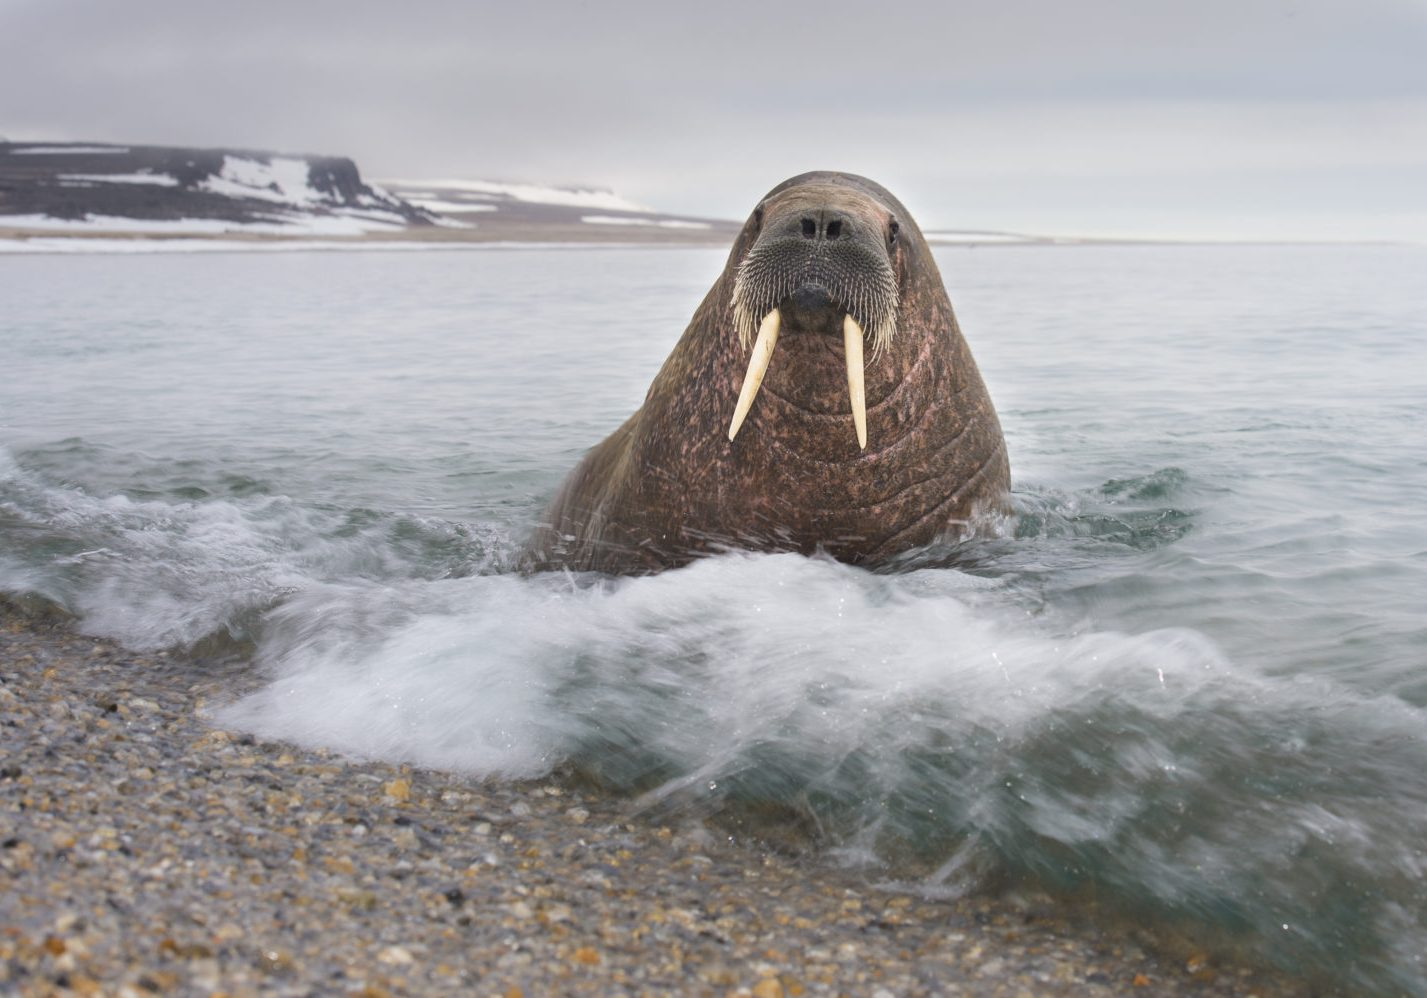 005400_Roy Mangersnes - wildphoto.no_www.nordnorge.com_Longyearbyen